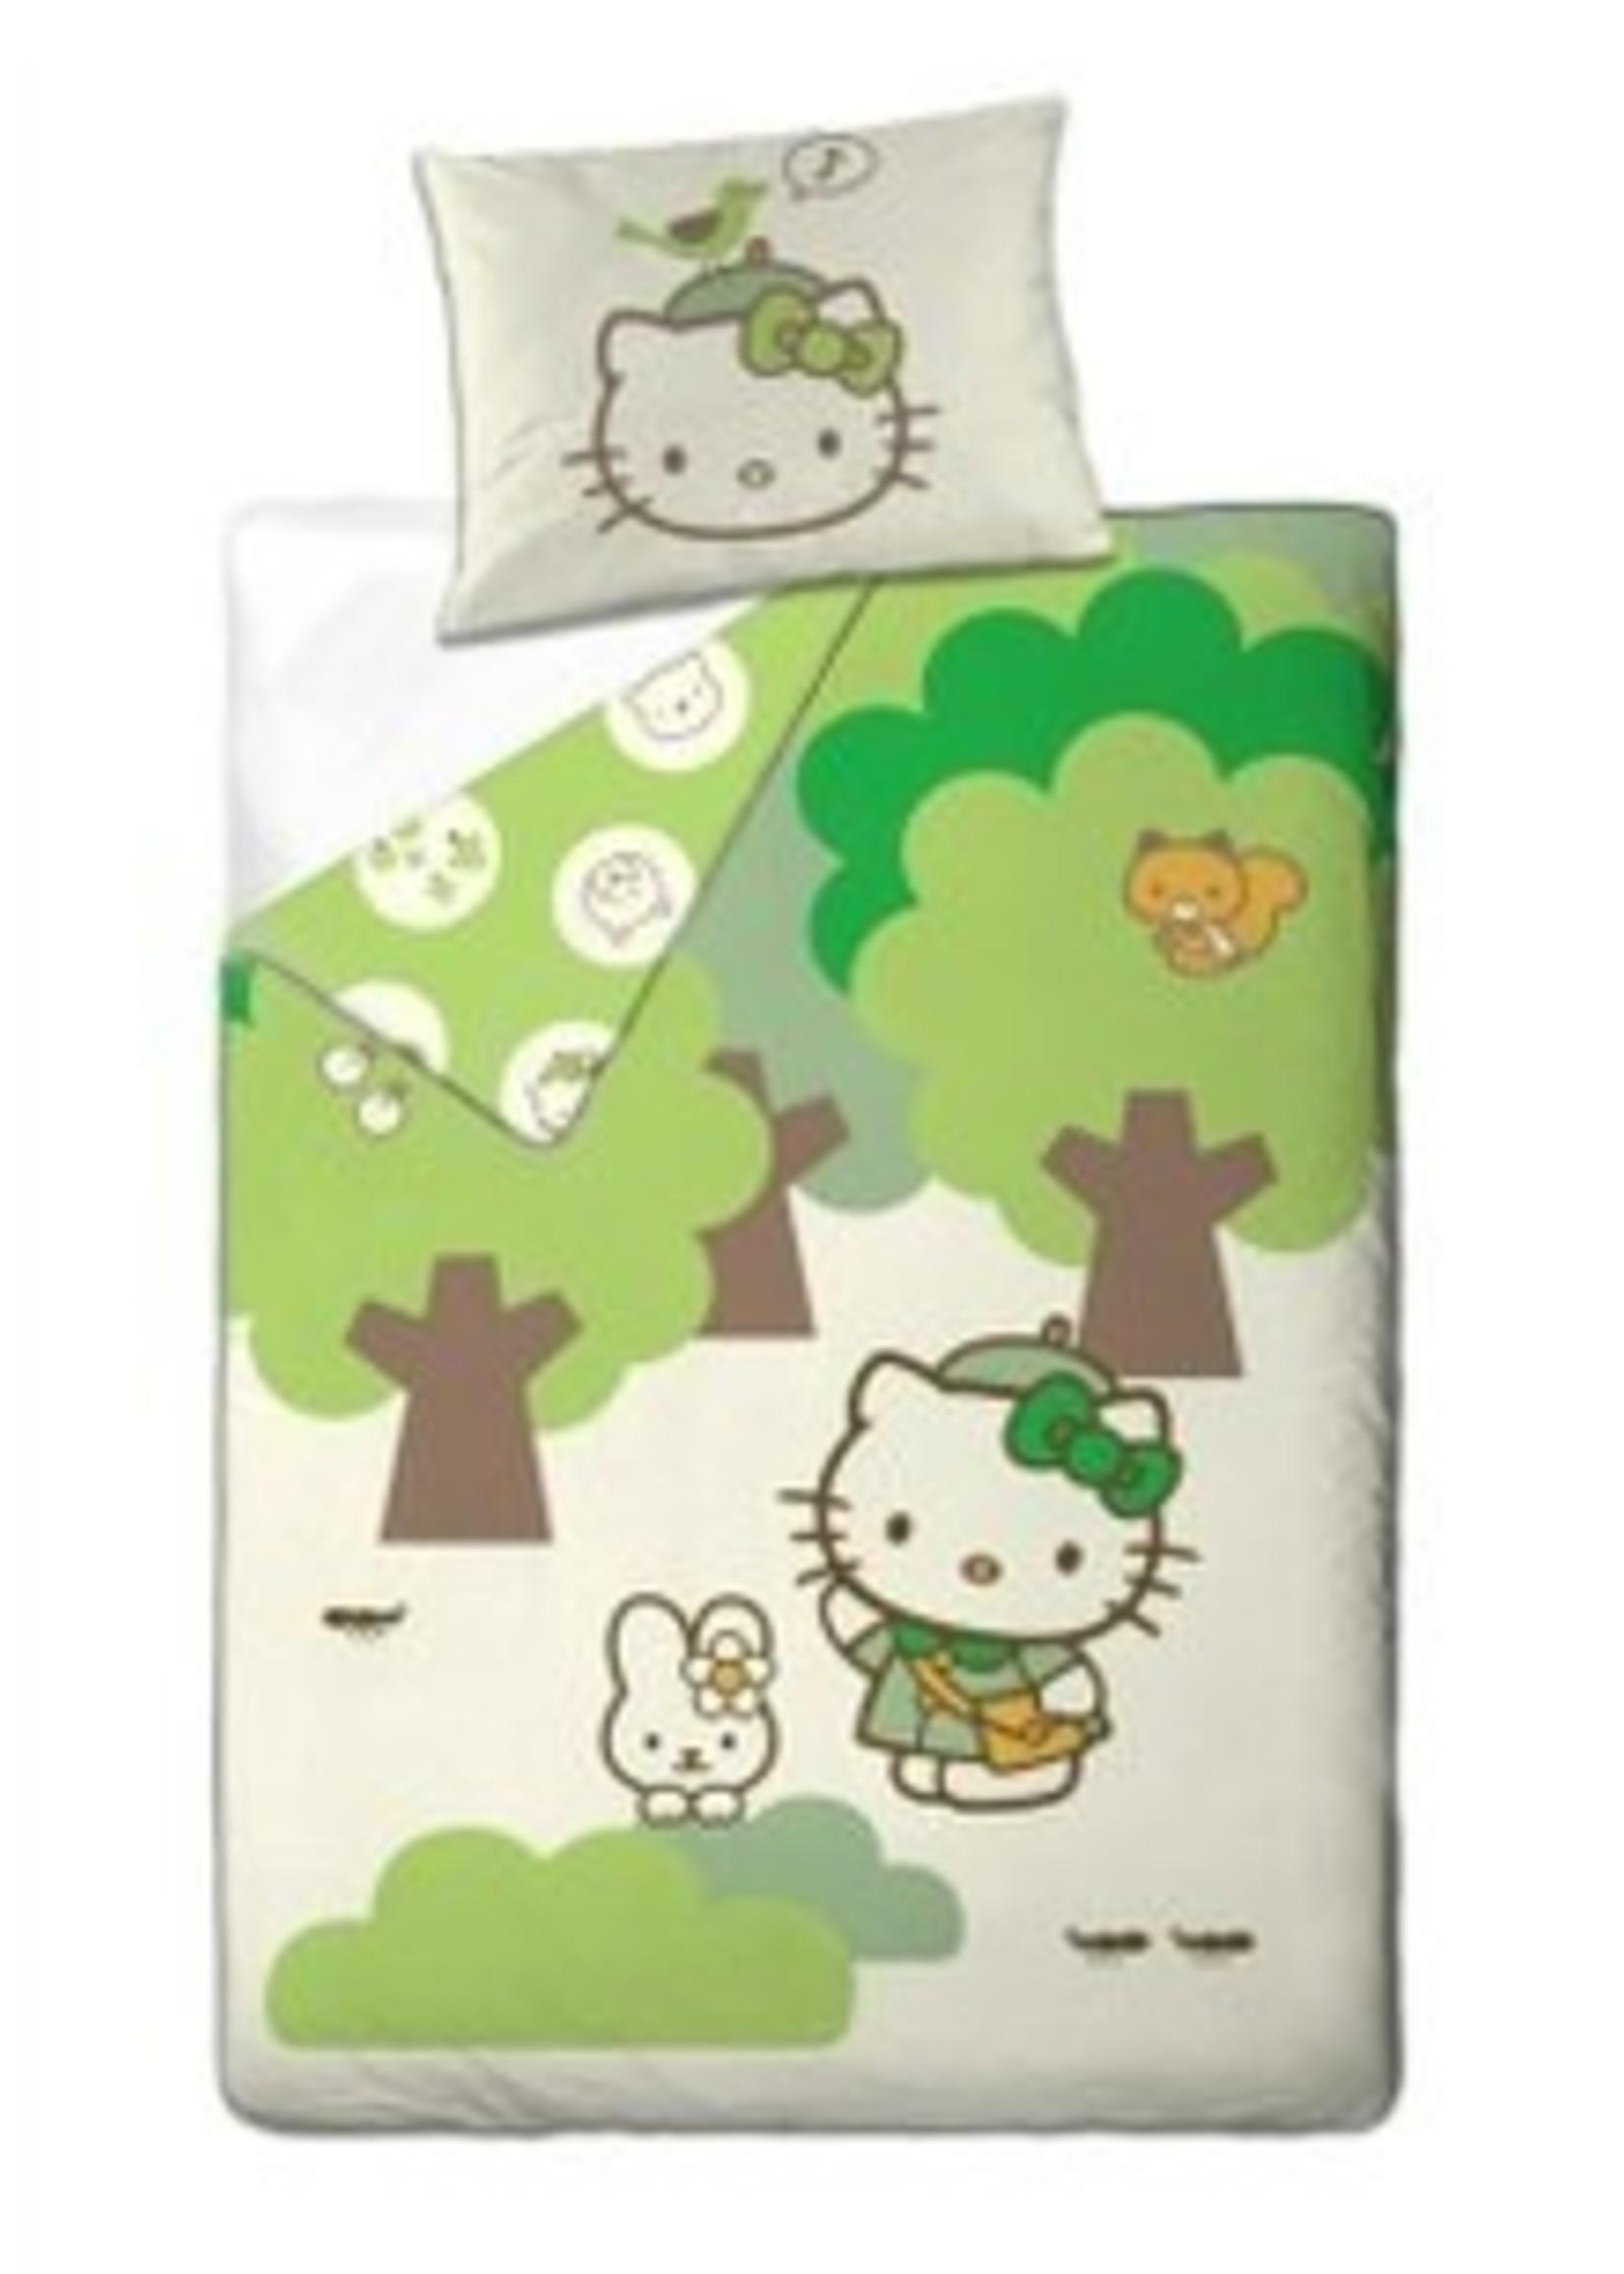 Hello Kitty Dekbedovertrek 140x200 Organic Katoen Bomen HK08177-OKB